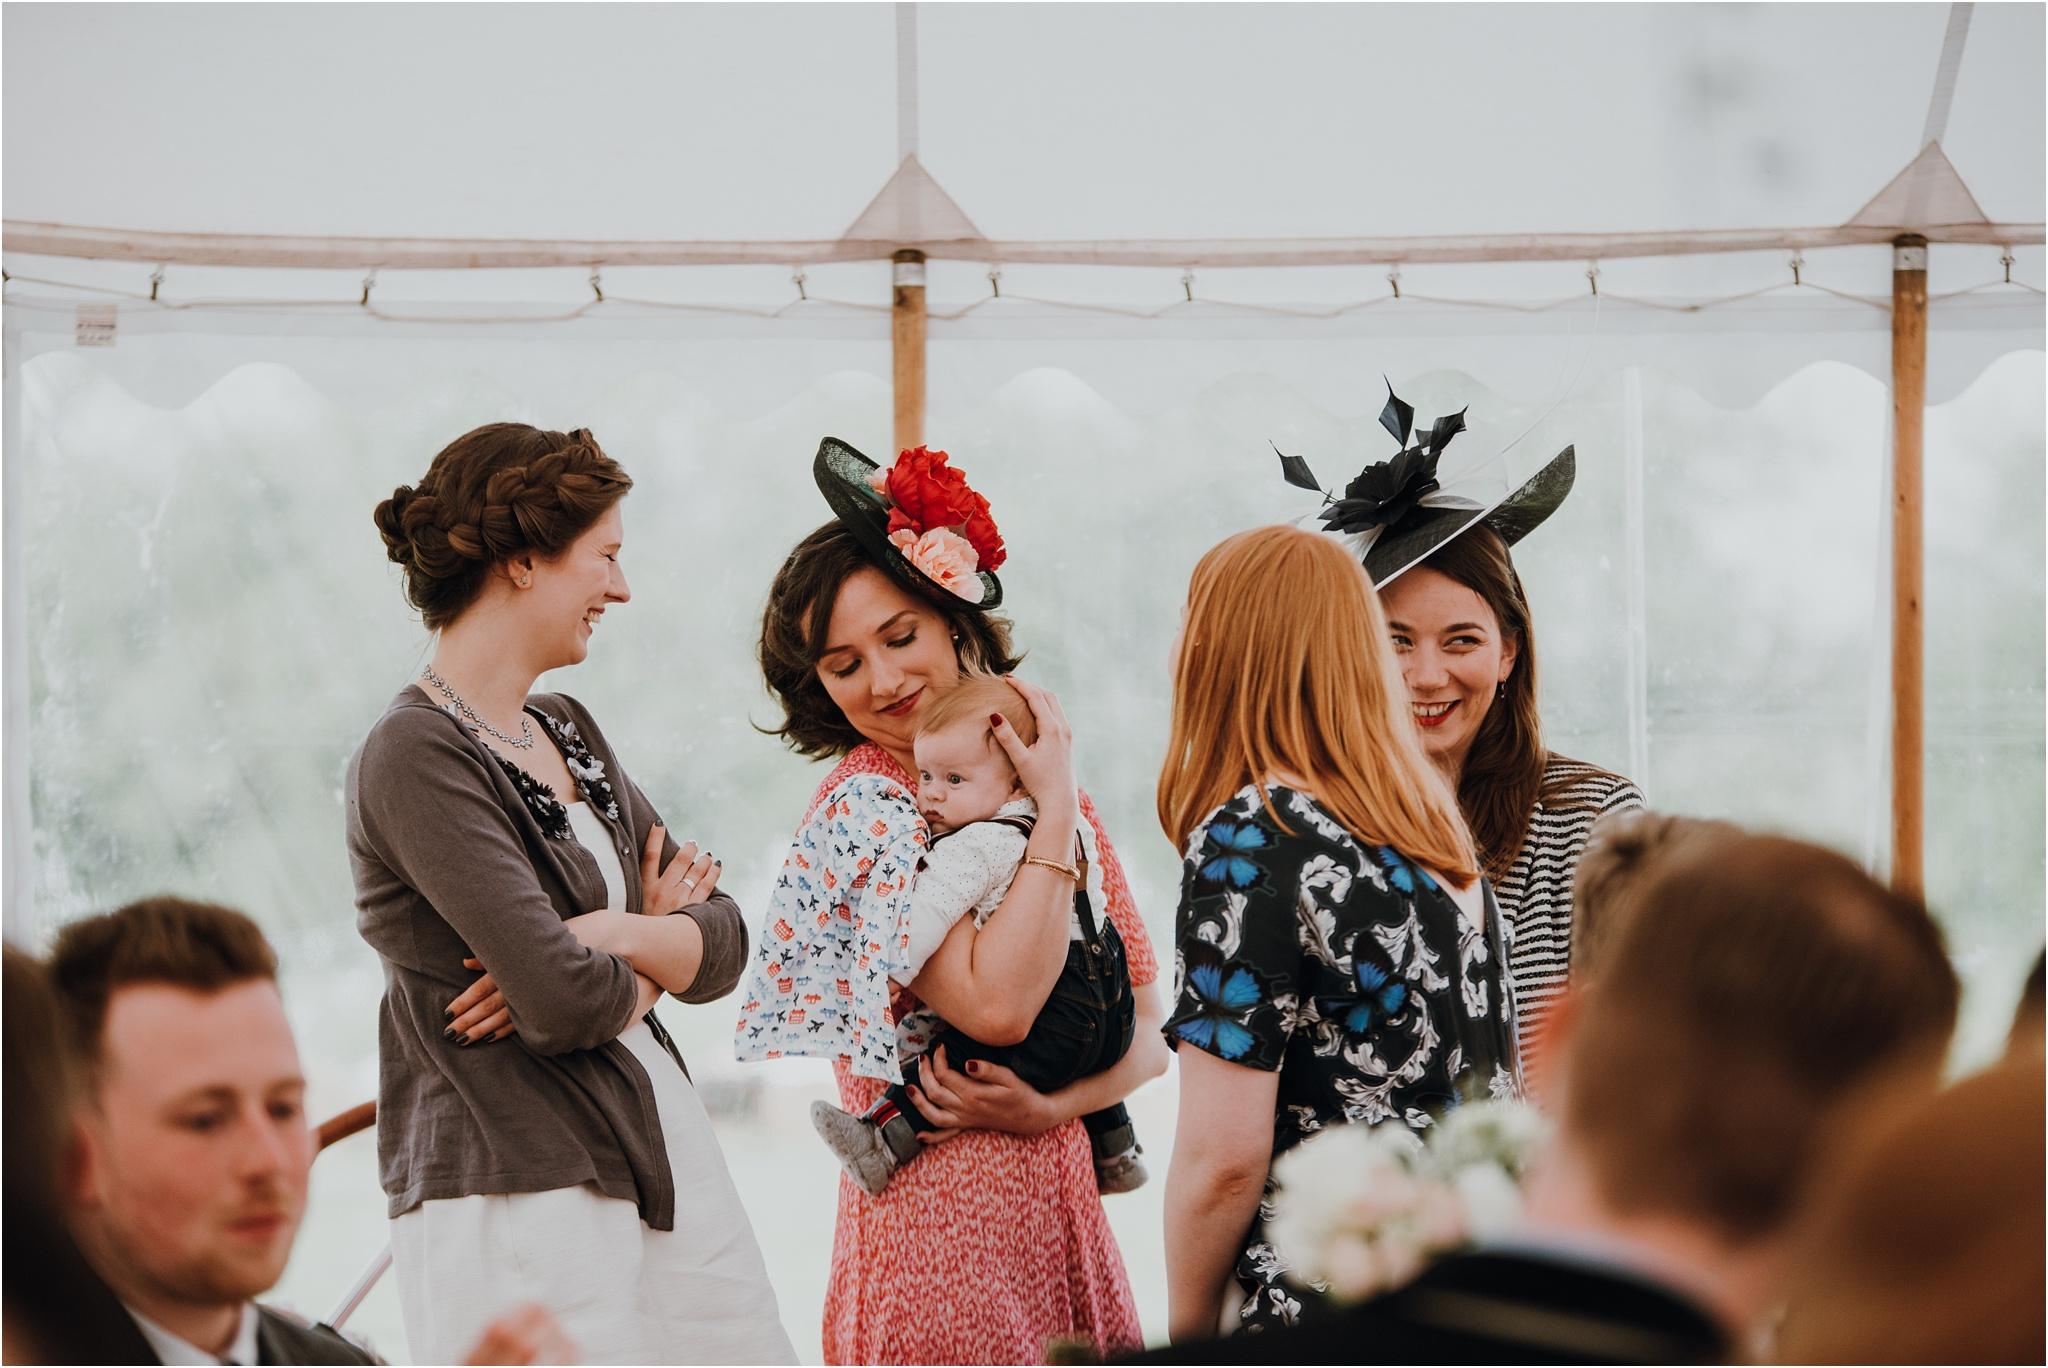 Outdoor-country-wedding-Edinburgh-photographer__0117.jpg